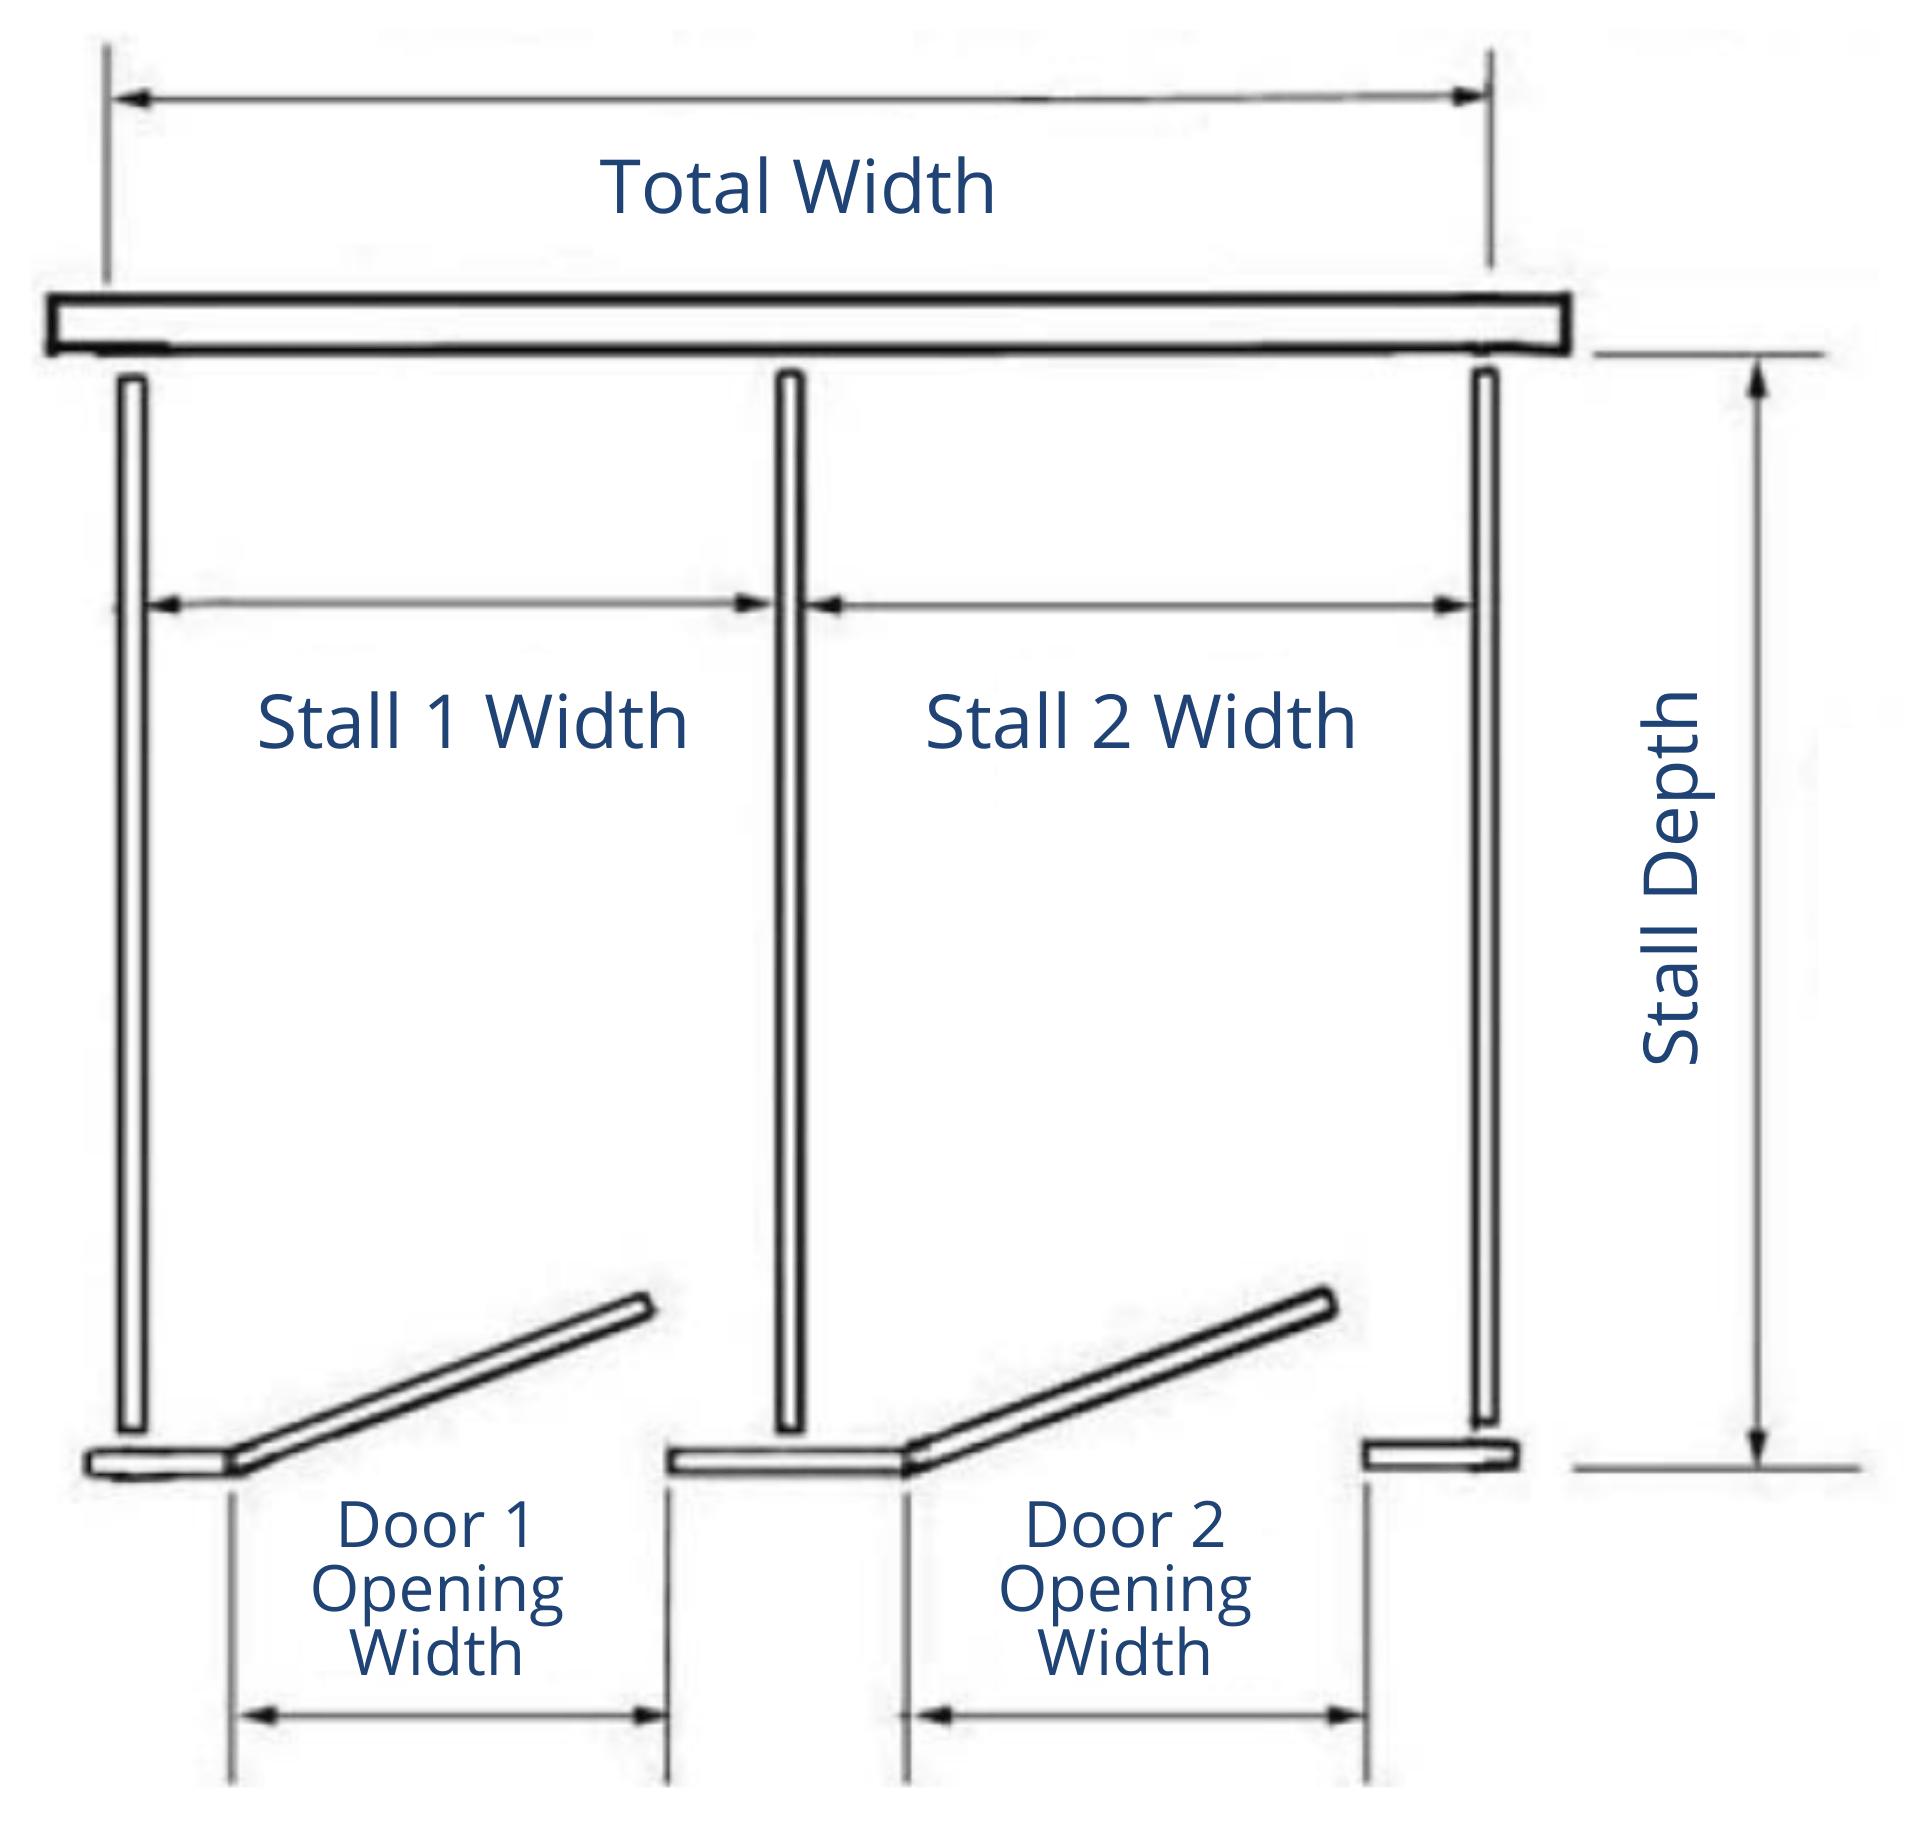 2 Stalls Free Standing Diagram